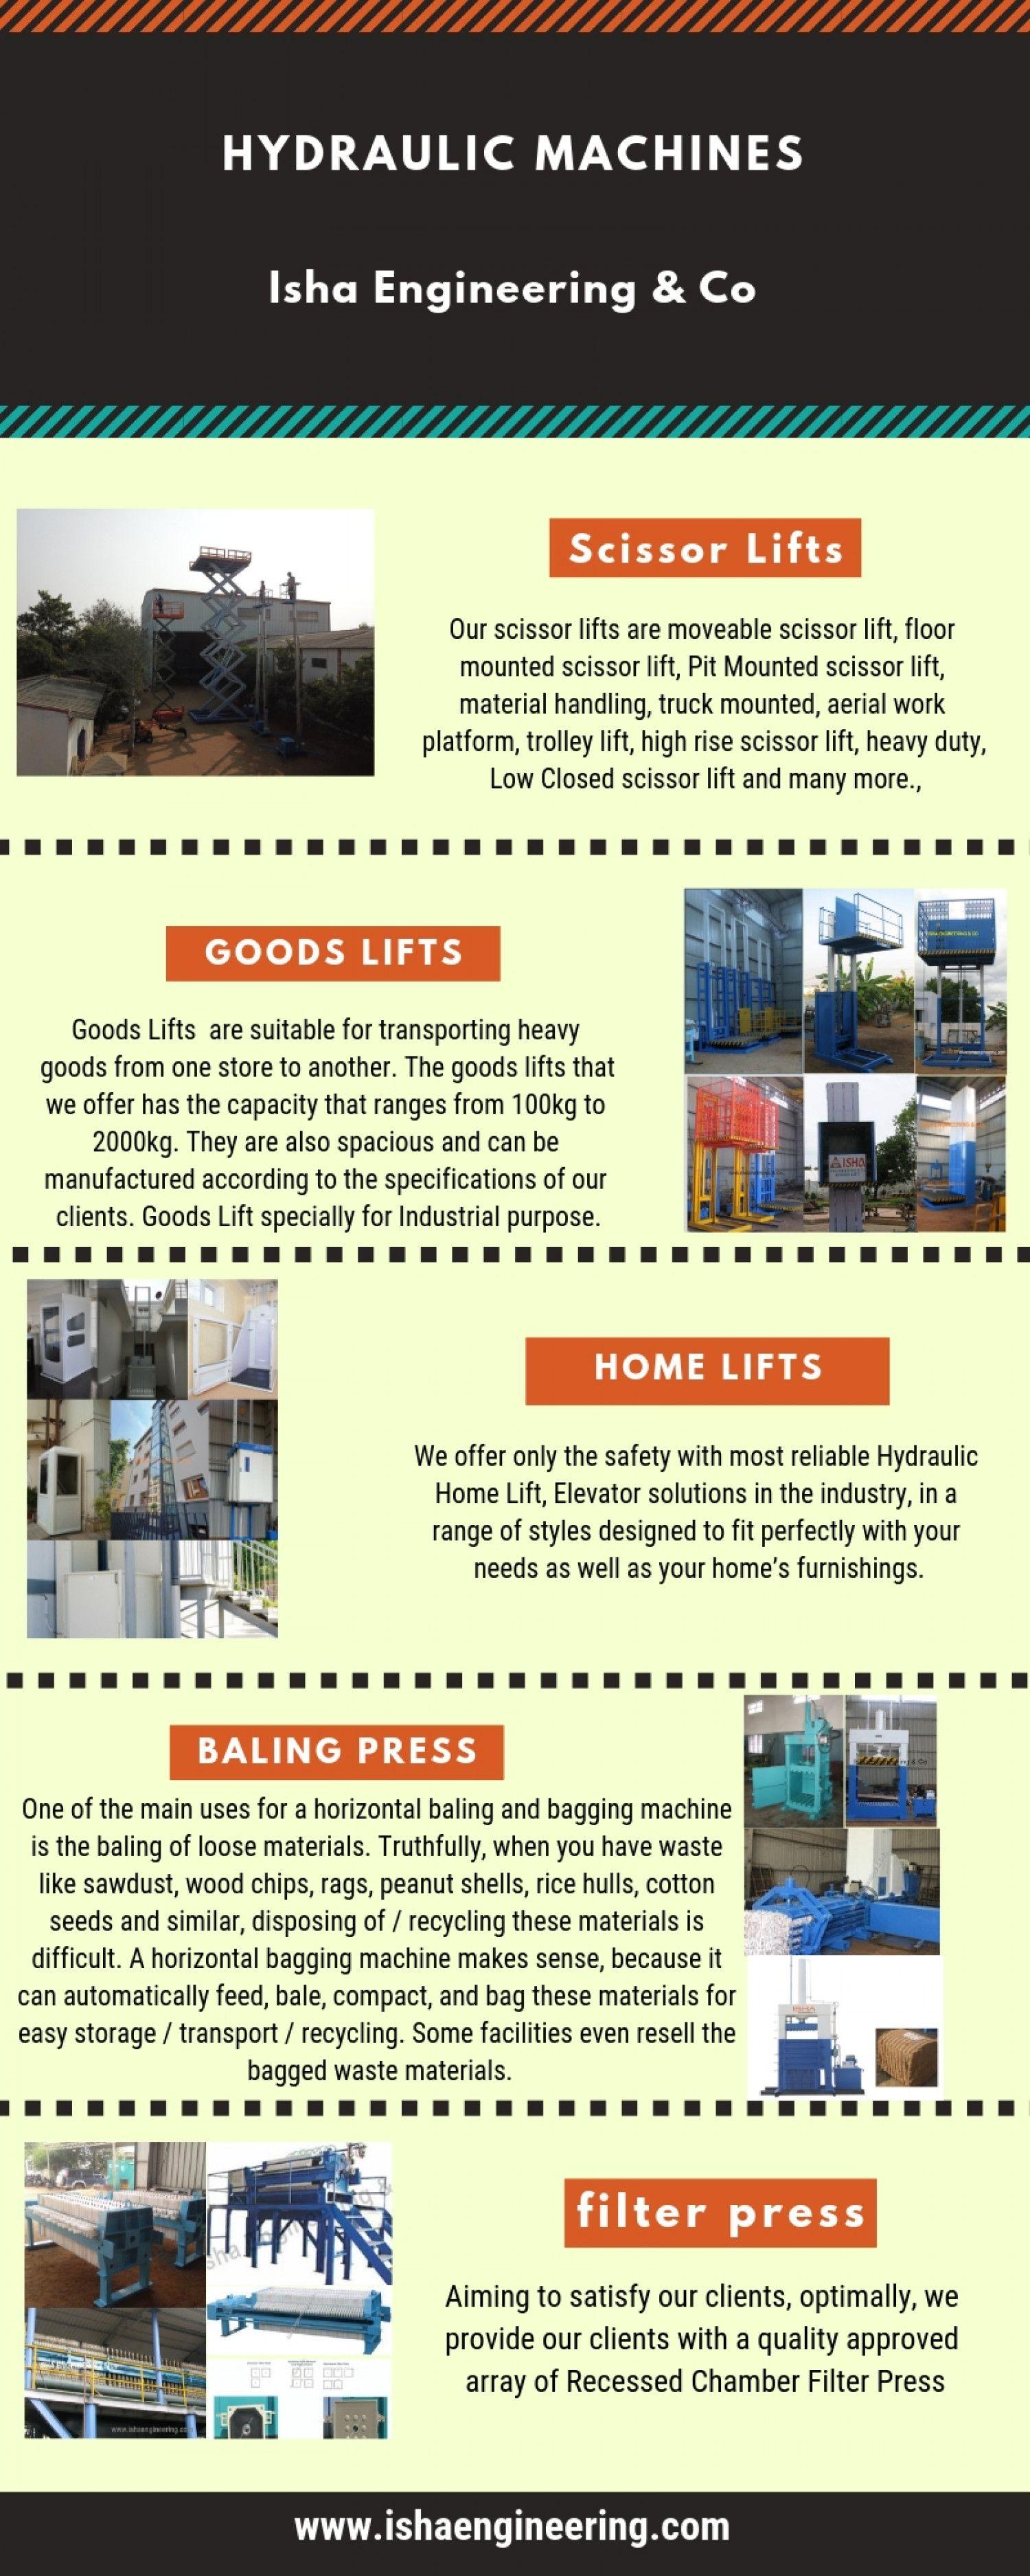 Hydraulic Machines Infographic Hydraulic, Garage lift